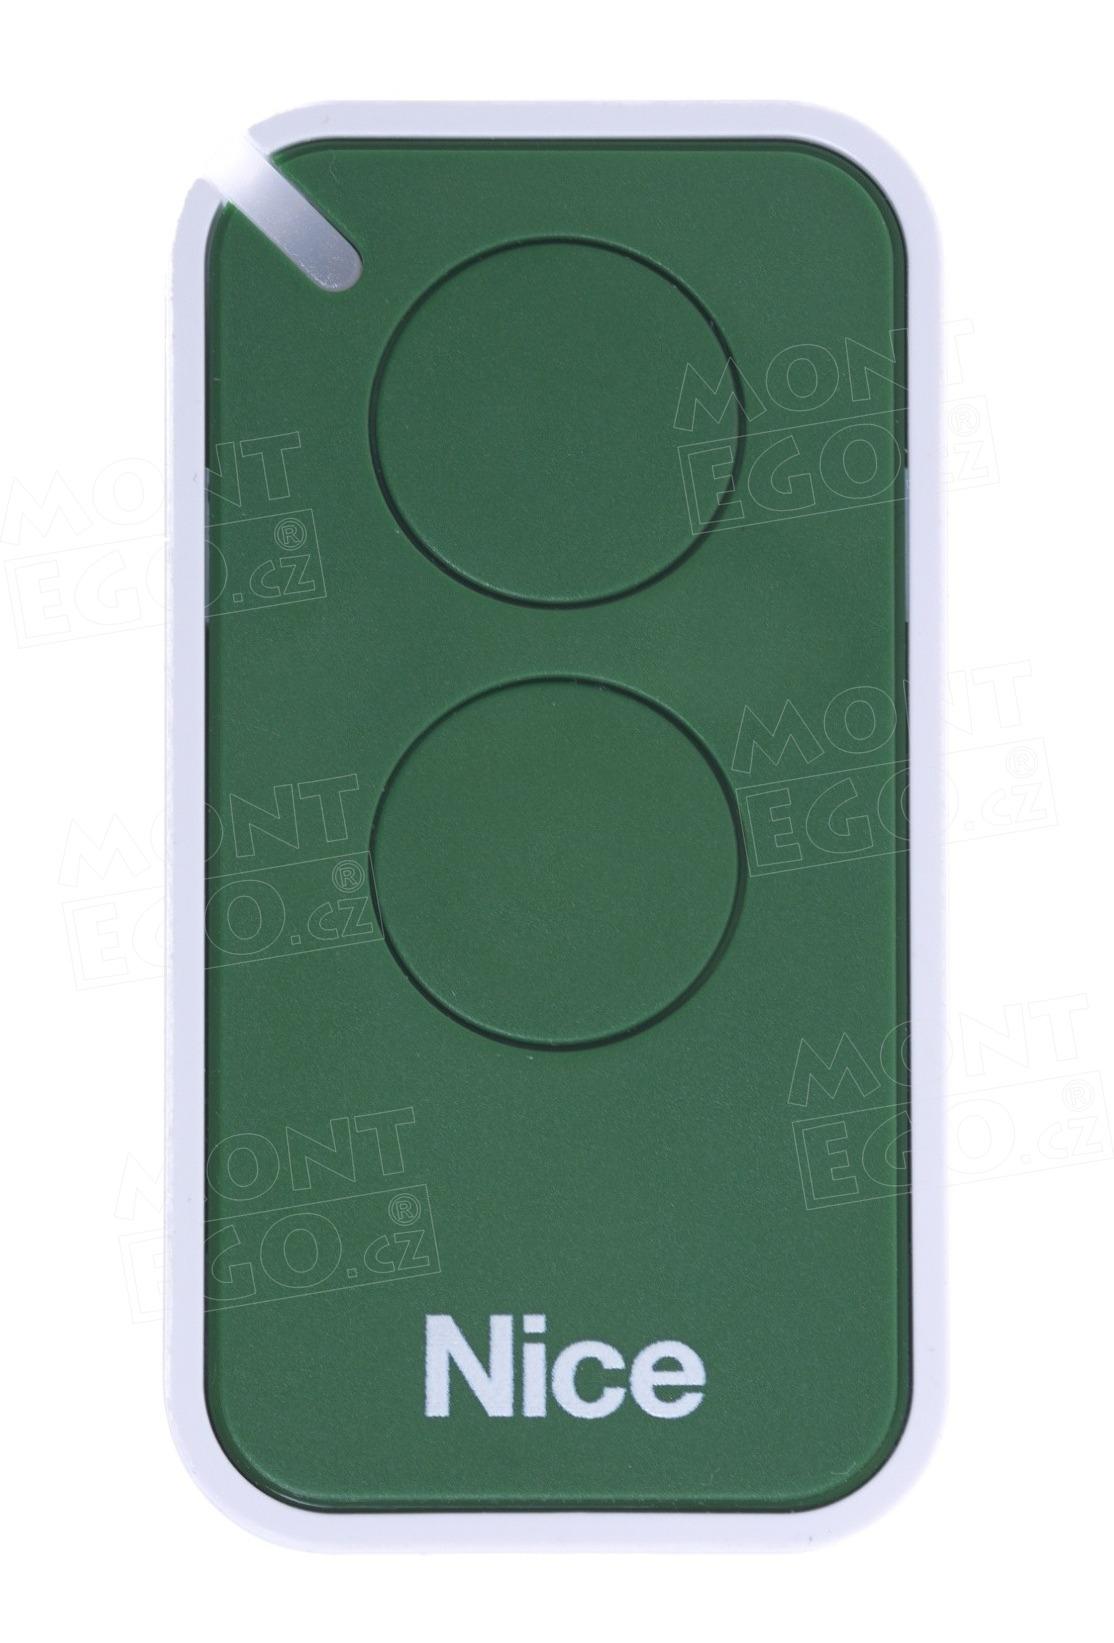 Ovladač brány Nice ERA INTI-2G, 2-kanálový, zelený, 433 MHz, INTI 2G